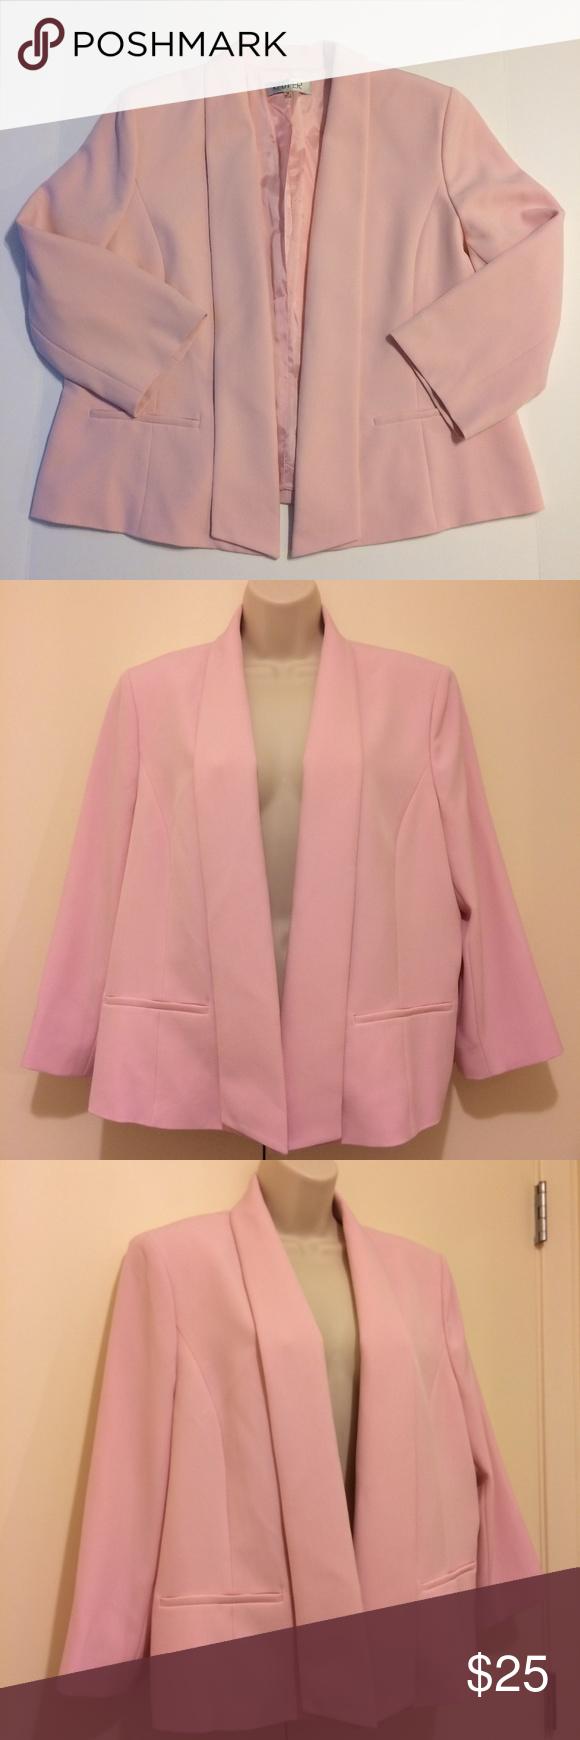 708600629c2 Kasper Jacket Ladies Size 16 Pink Career Blazer Kasper Jacket Blazer  Women s  Size 16